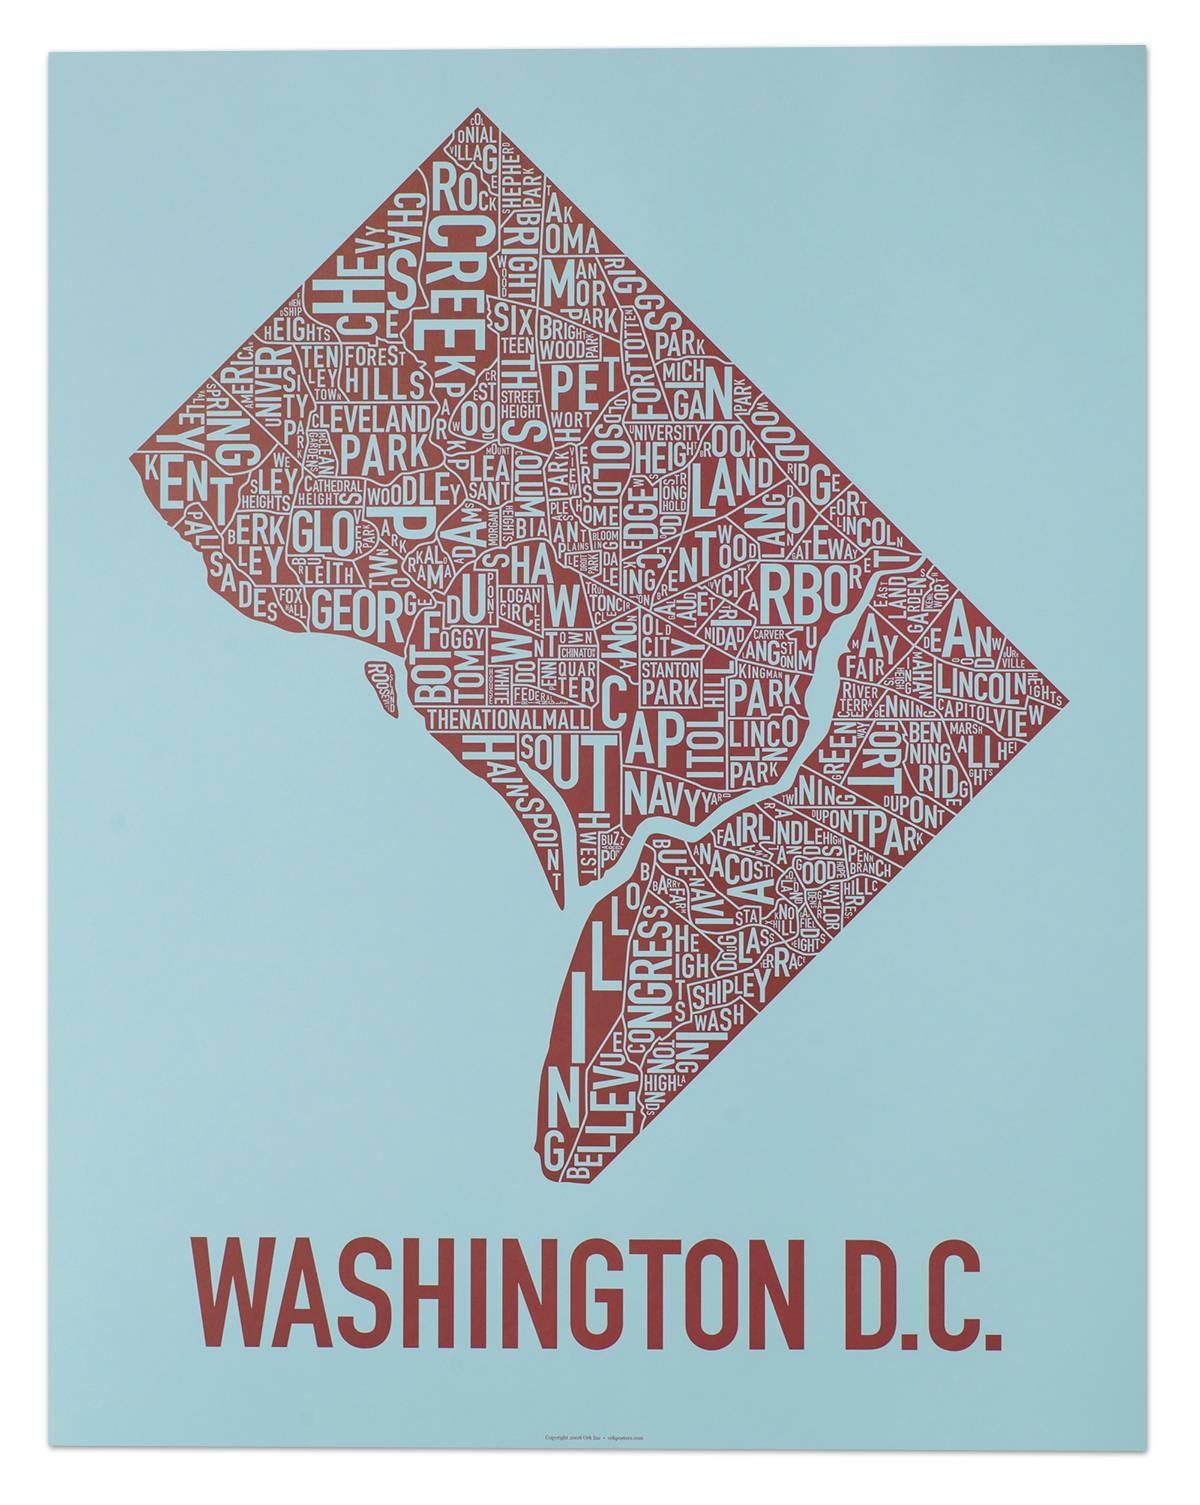 Washington Dc Neighborhood Map Posters & Prints – Modern Wall Decor For Latest Washington Dc Map Wall Art (View 8 of 20)